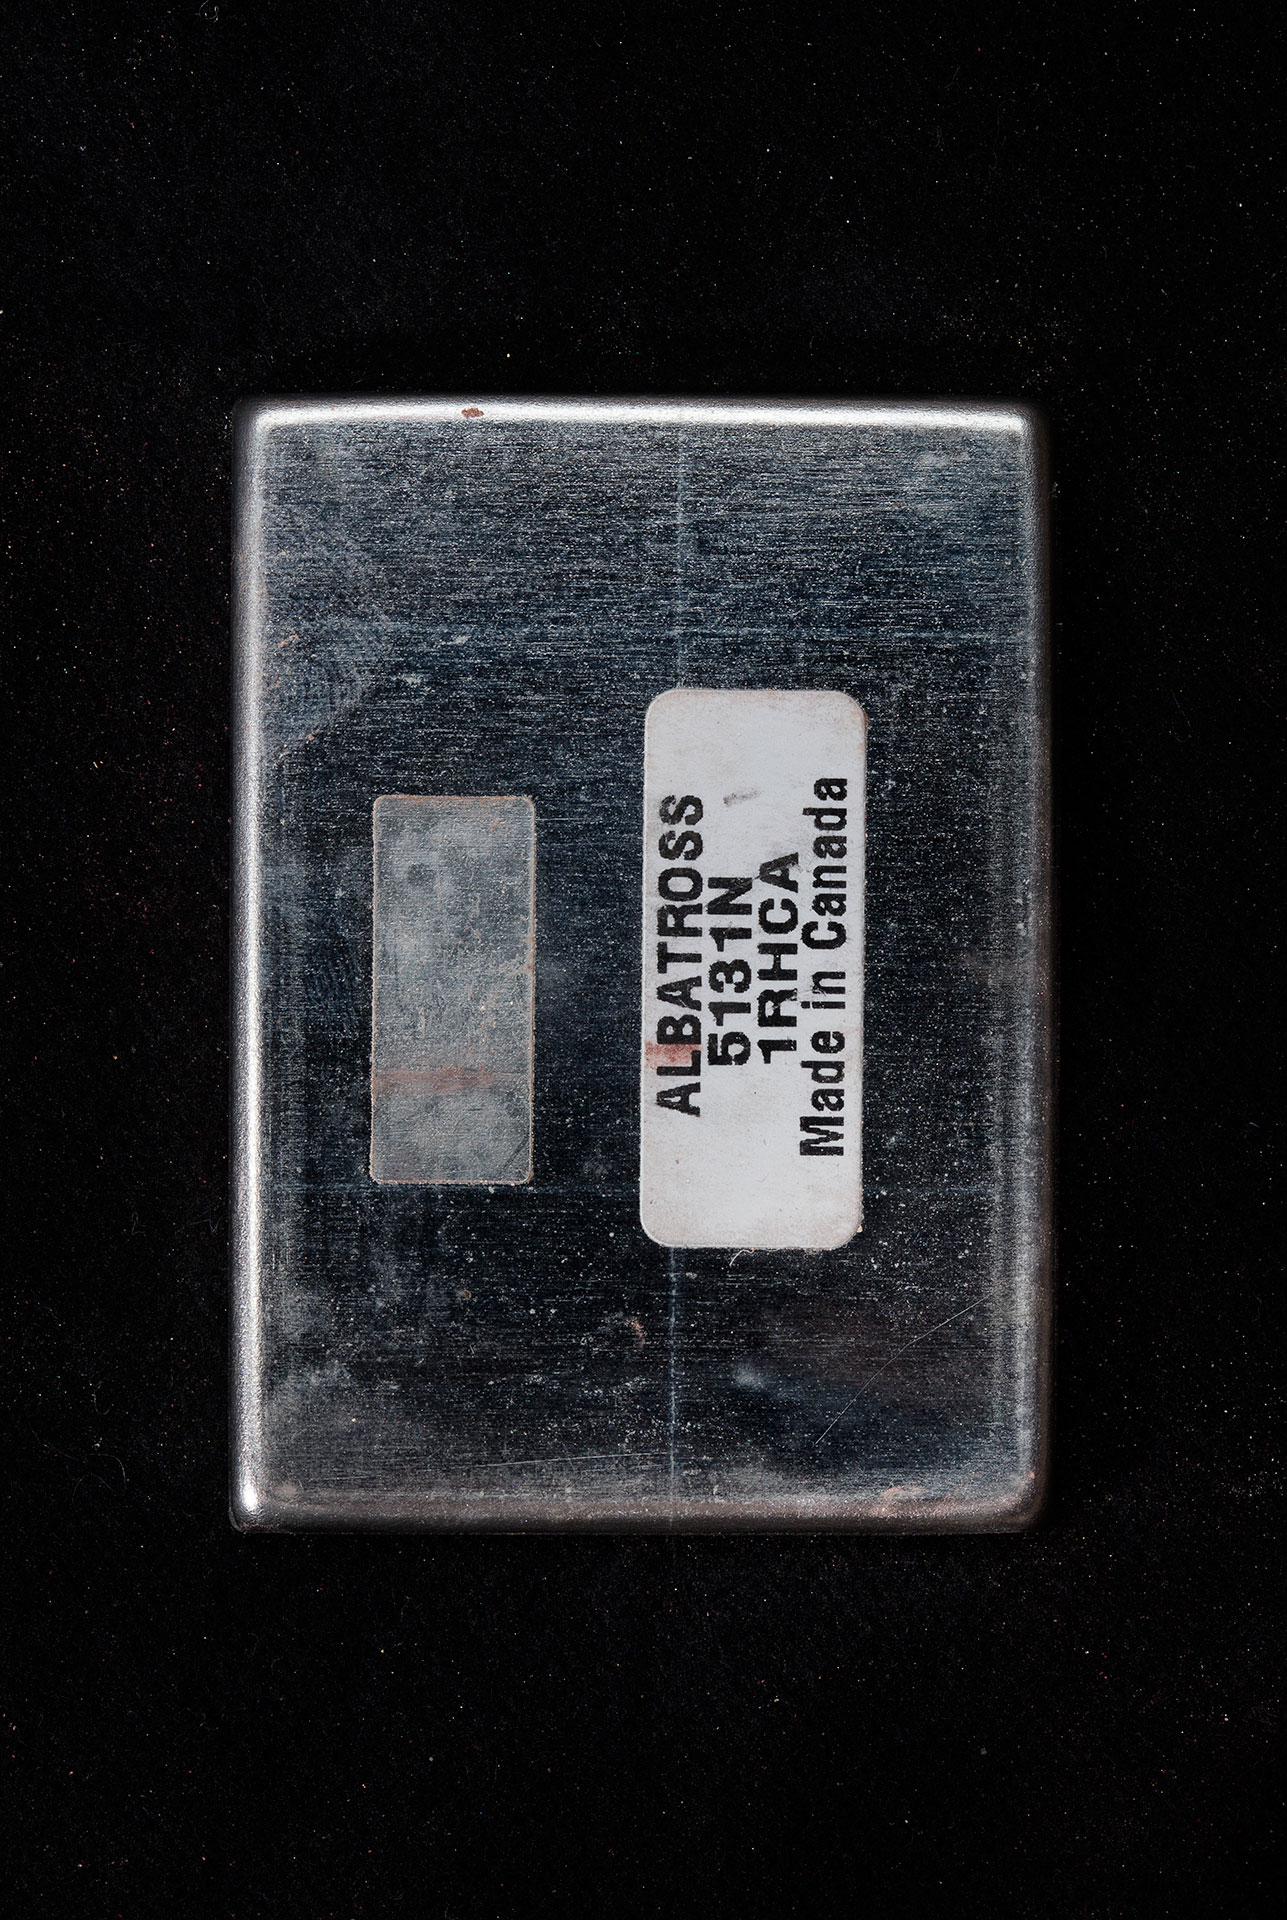 ALBATROSS-5131N-1RHCA-B 70X100cm 5Editions